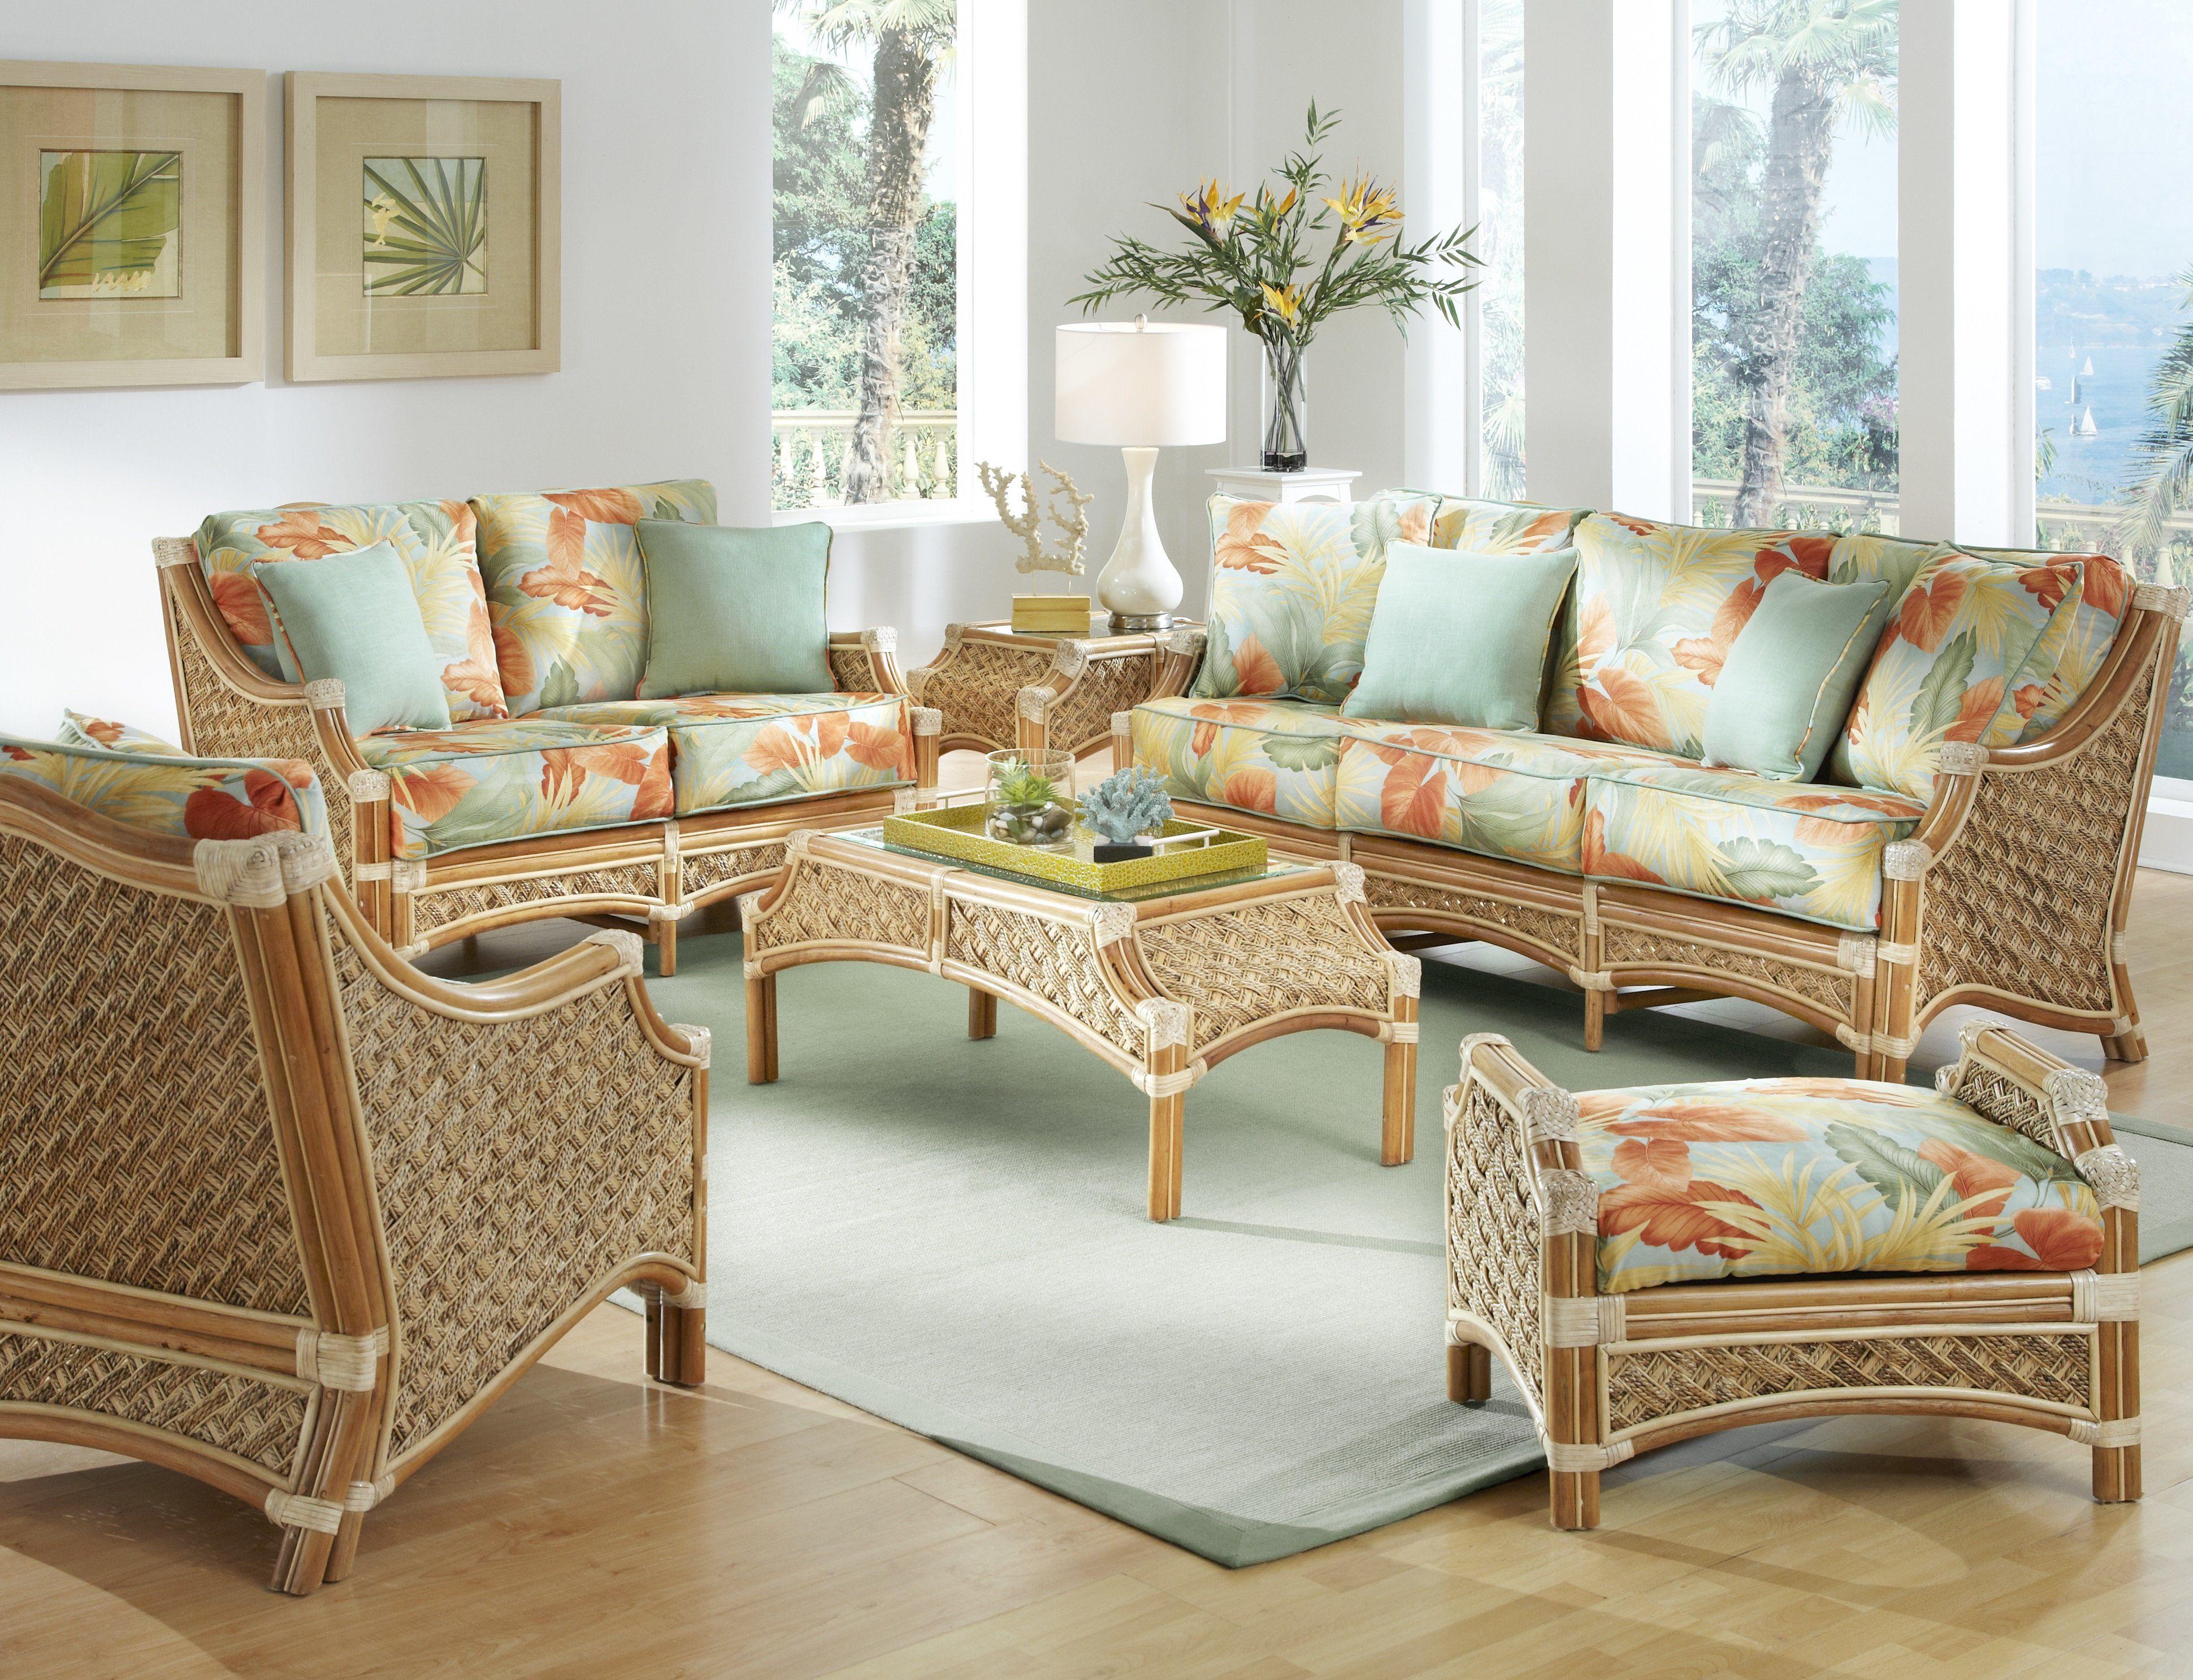 13 Smart Designs of How to Makeover 6 Piece Living Room Set ...